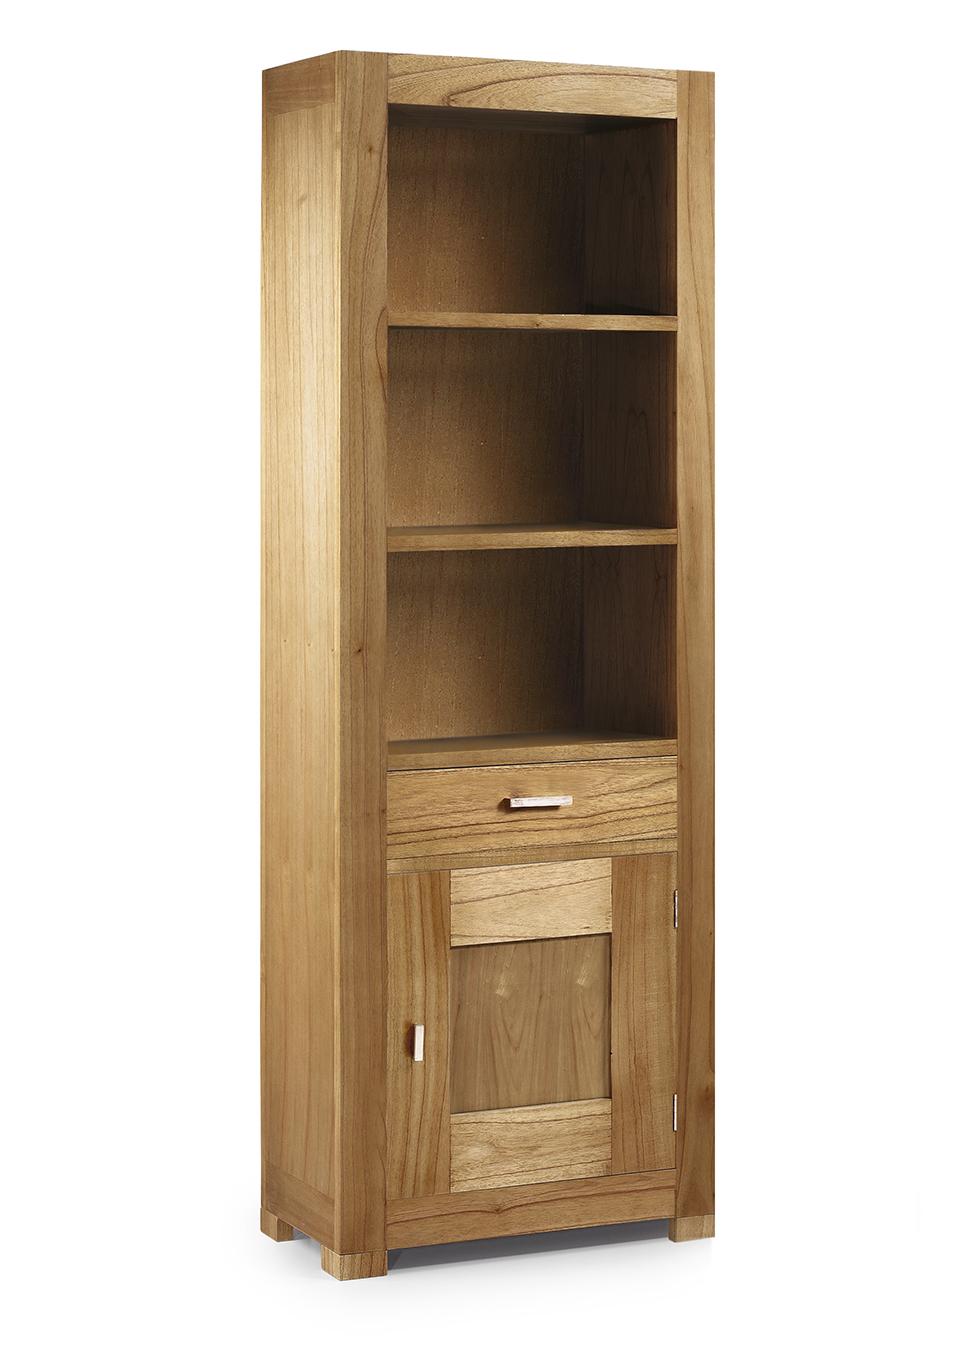 Biblioth Que En Bois Naturel 1 Tiroir 1 Porte 3 Espaces De  # Tiroir Rangement Dvd